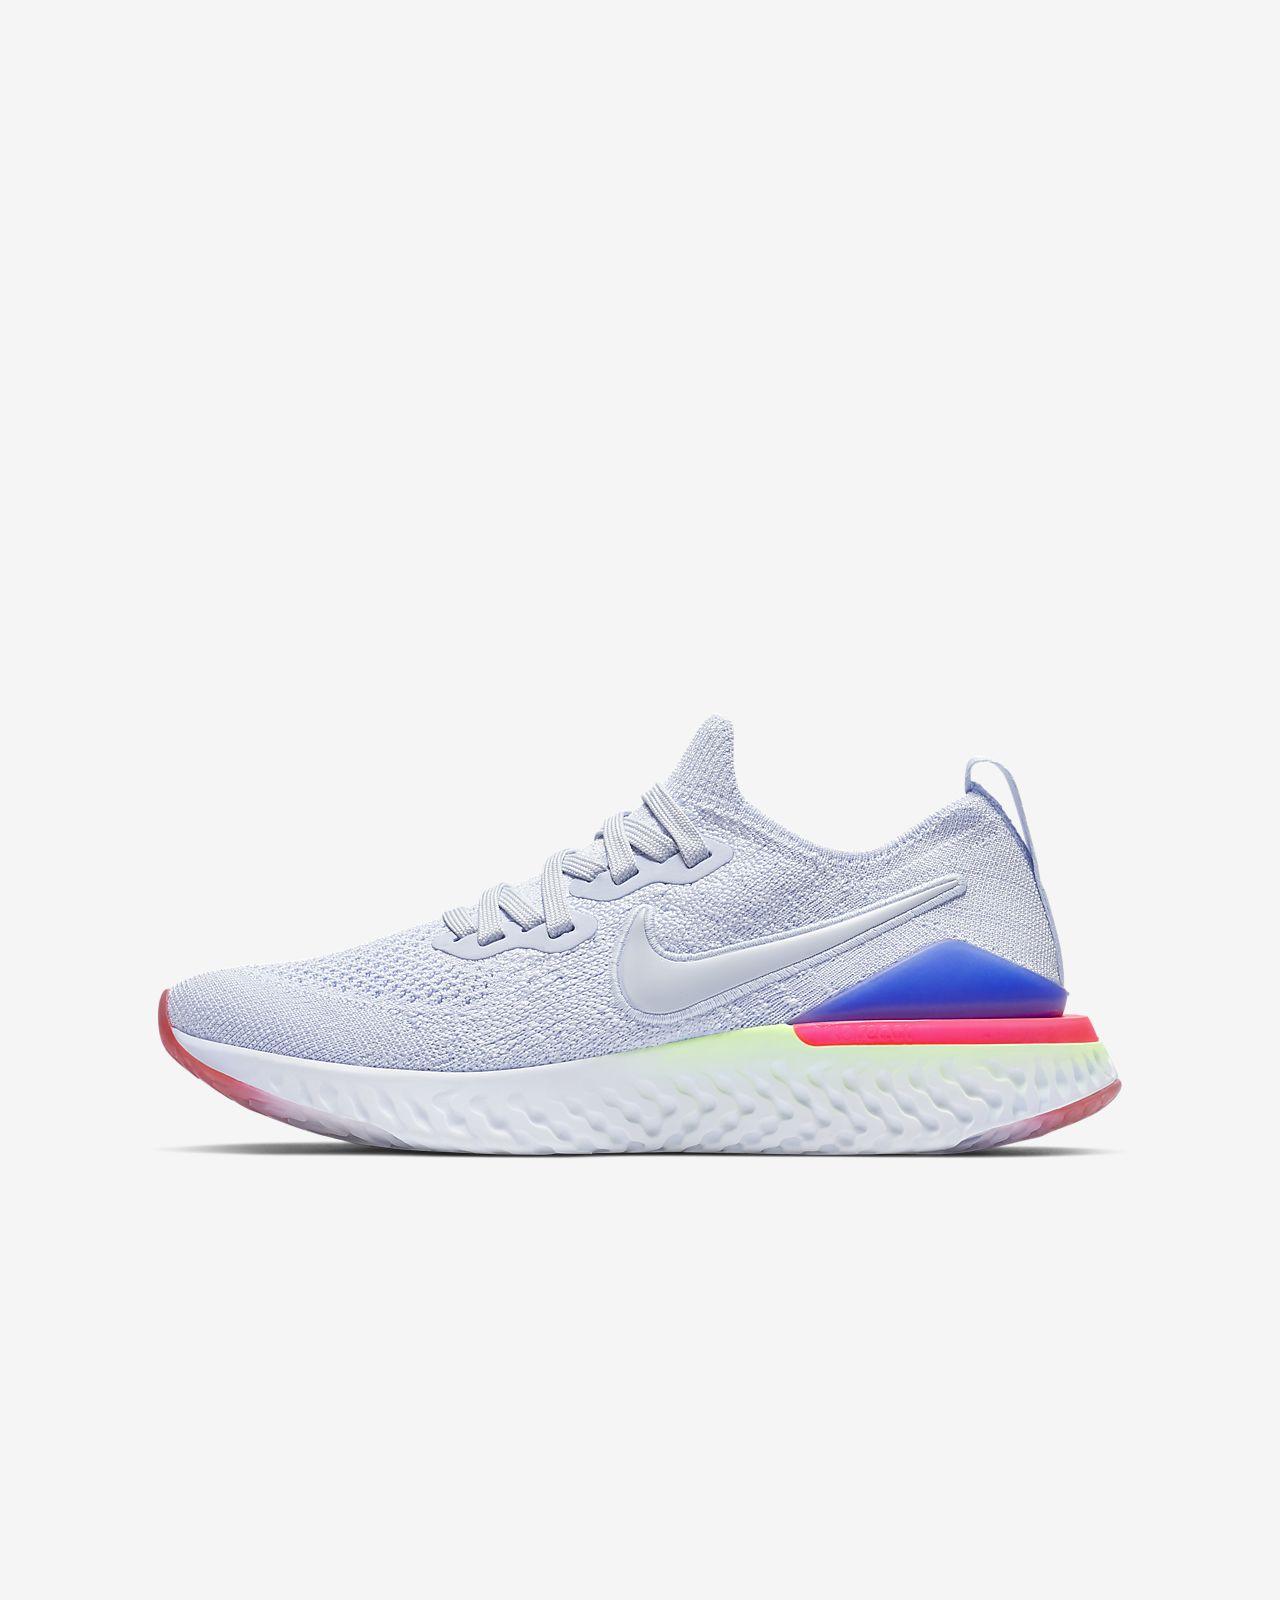 hot sale online 6fc4d 8bf7b ... Calzado de running para niños talla grande Nike Epic React Flyknit 2